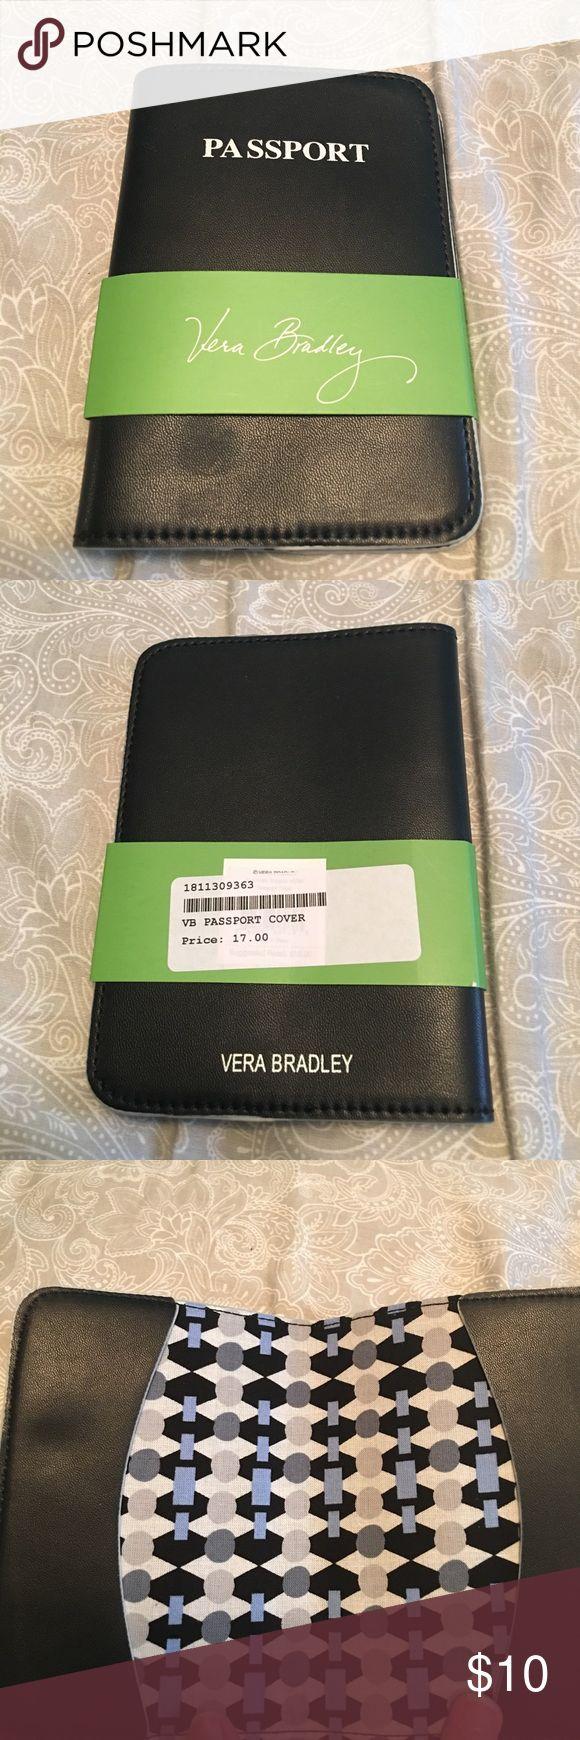 The 25 best same day passport ideas on pinterest anne frank final price vera bradley passport cover nwt ccuart Images